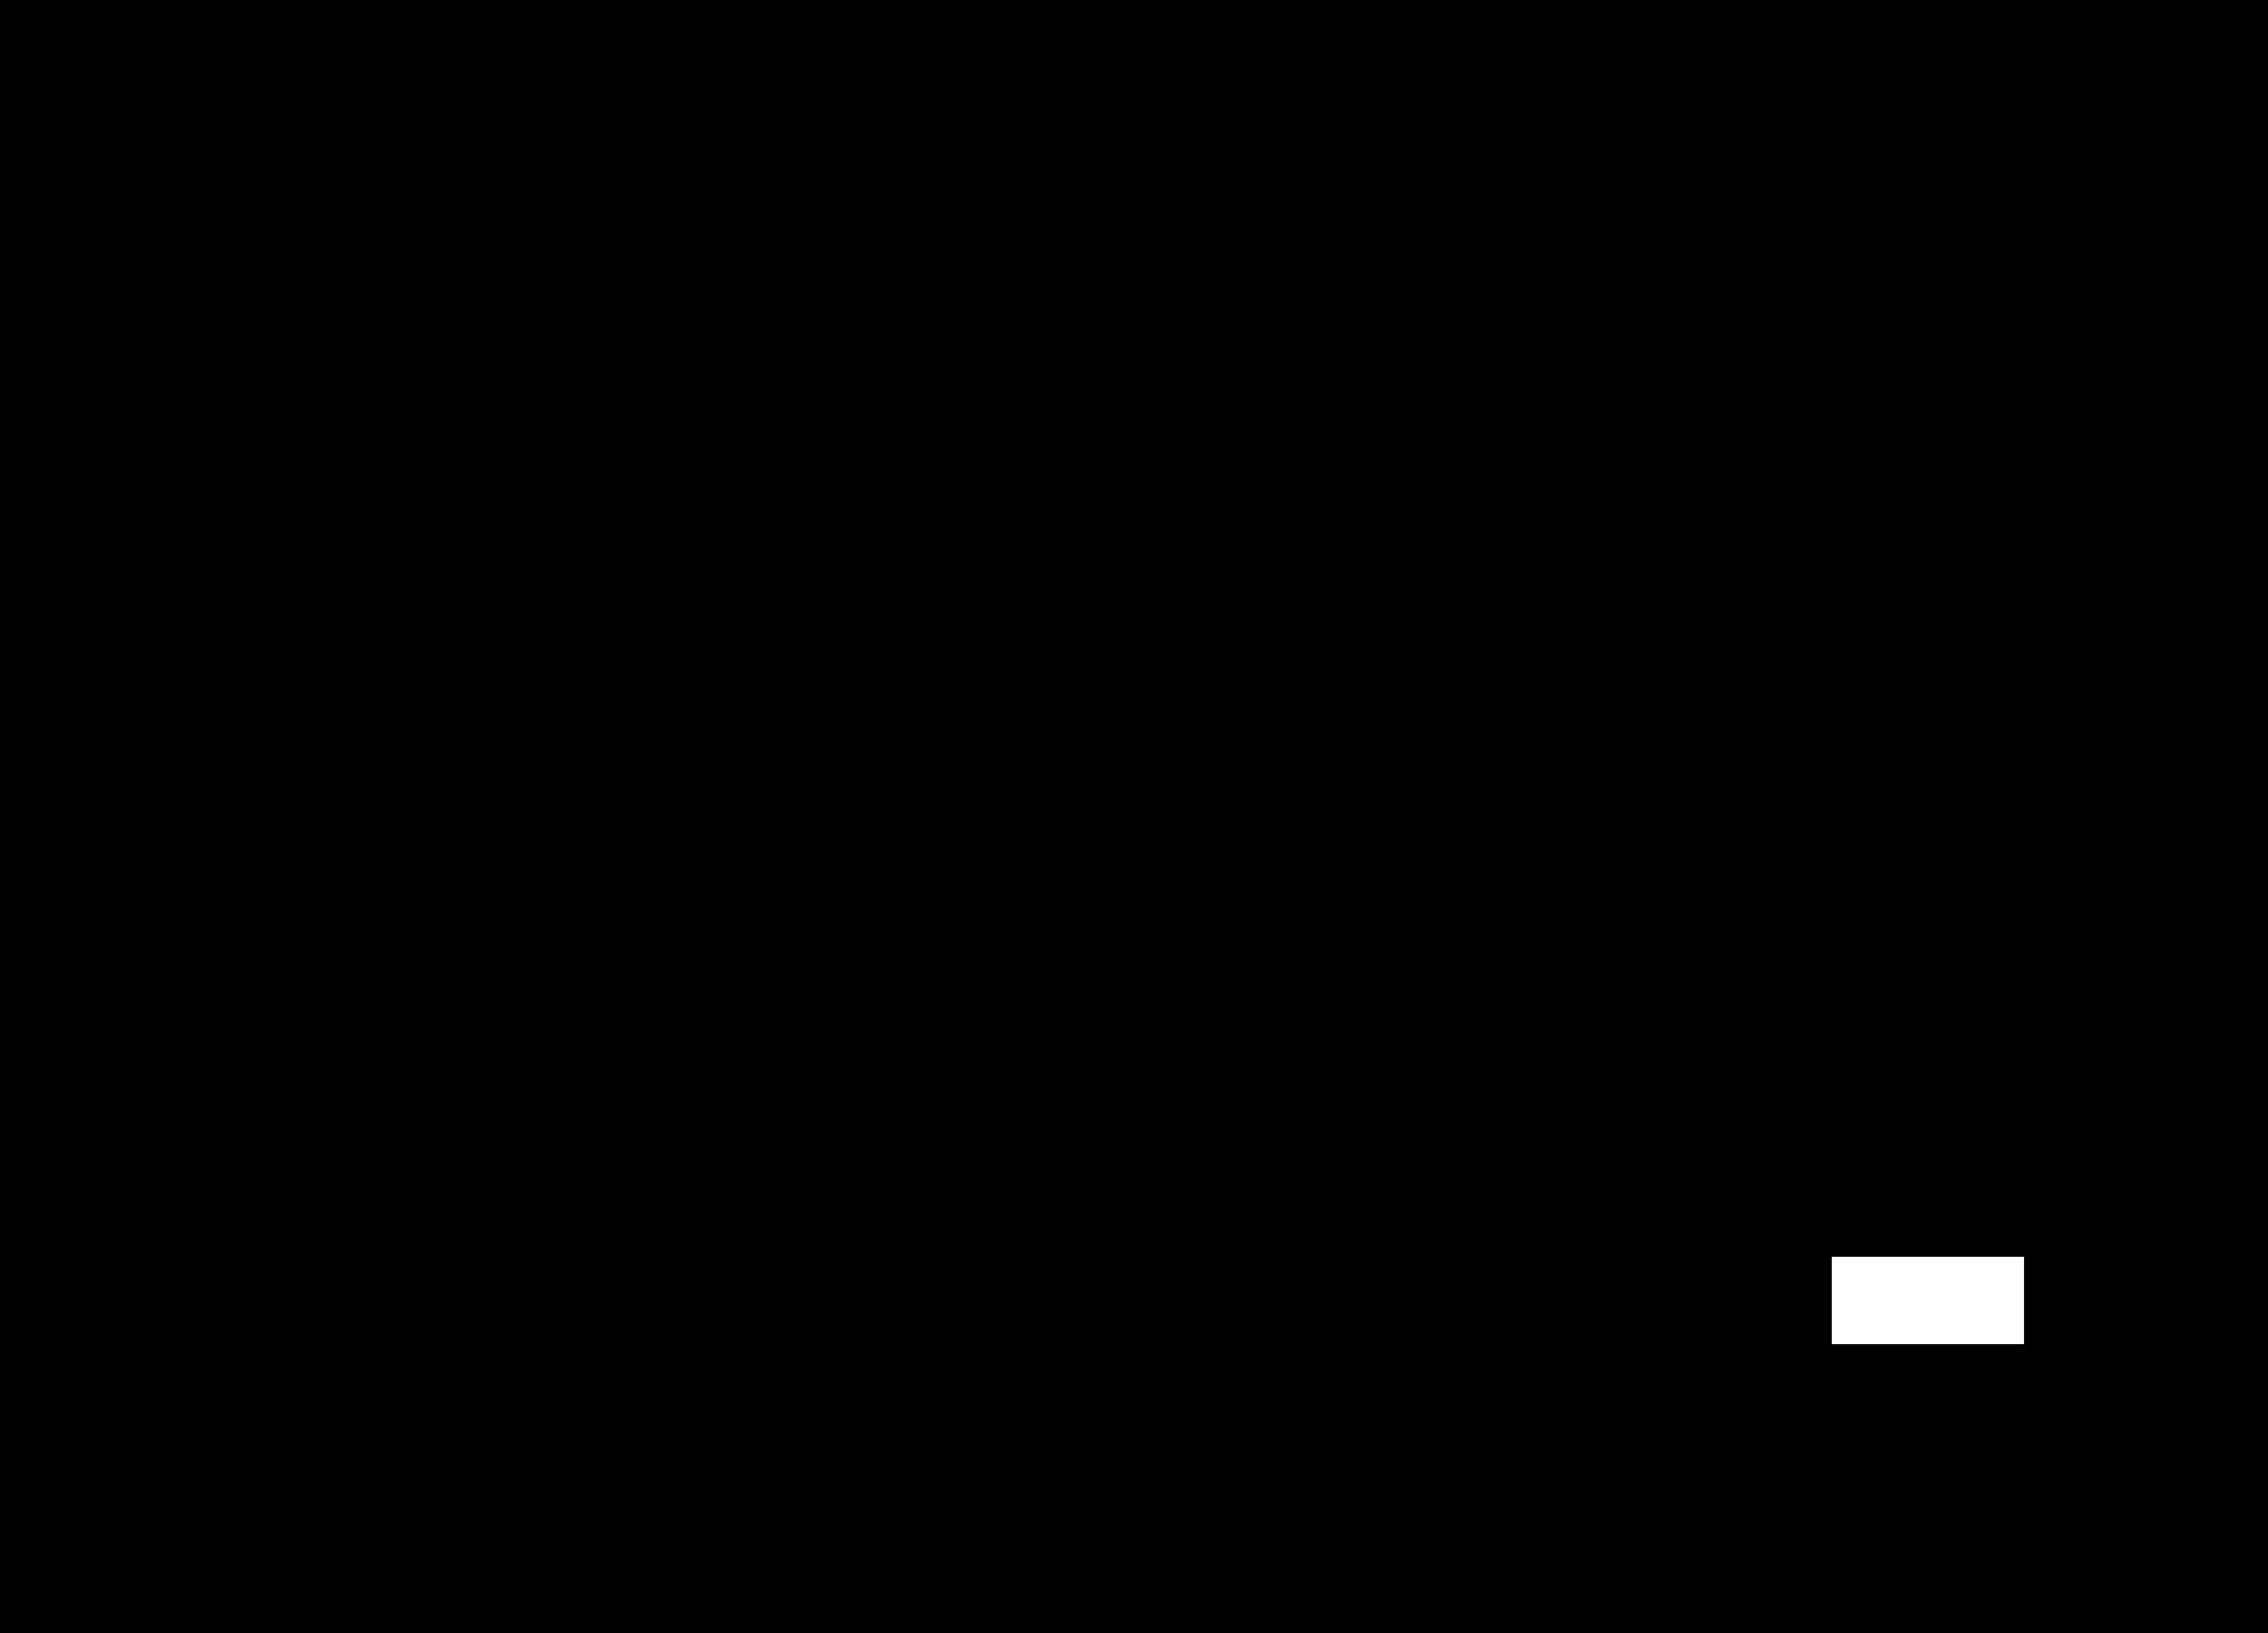 Apex Legends Logo High Resolution Png Image Arte De Videojuegos